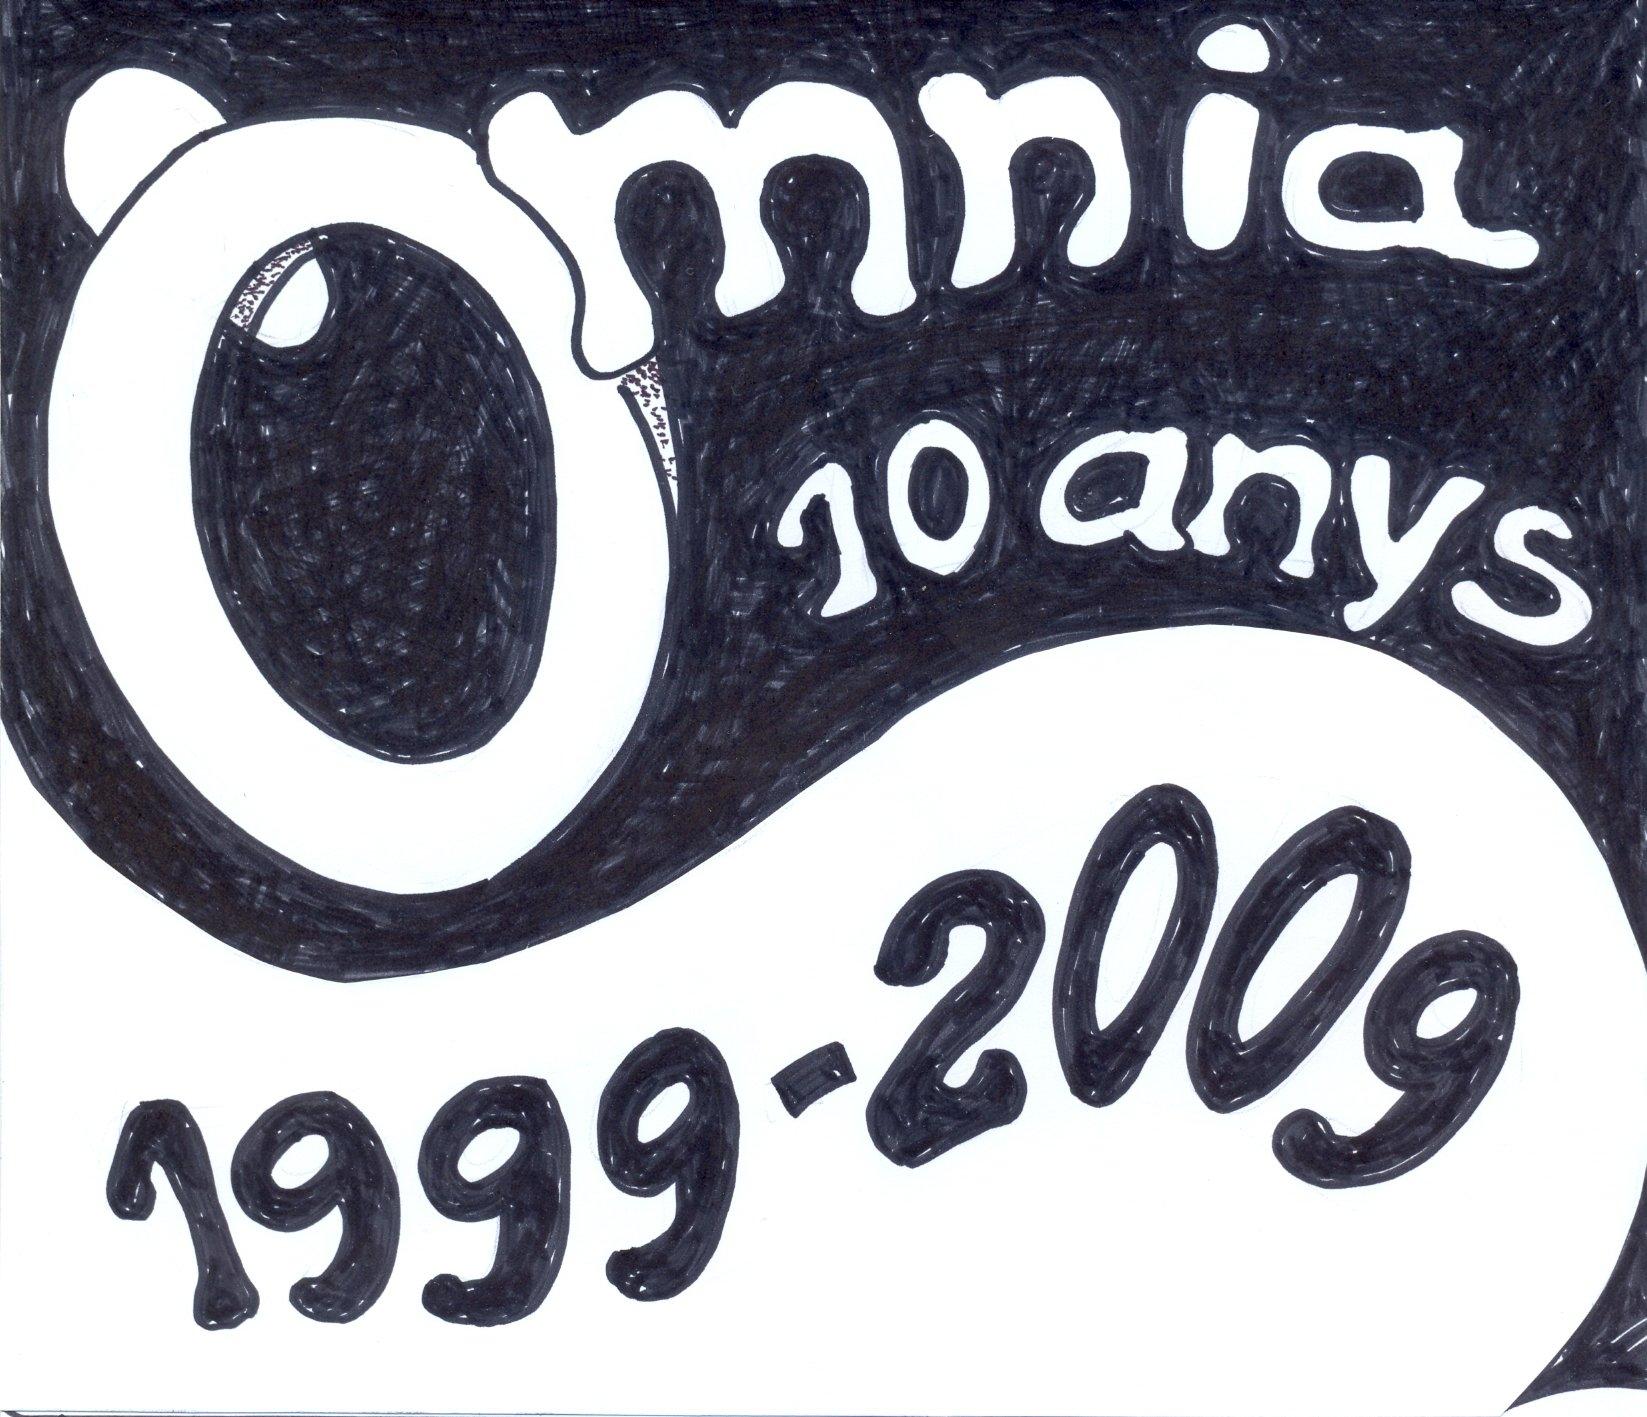 LOGO omnia 10 aniversari